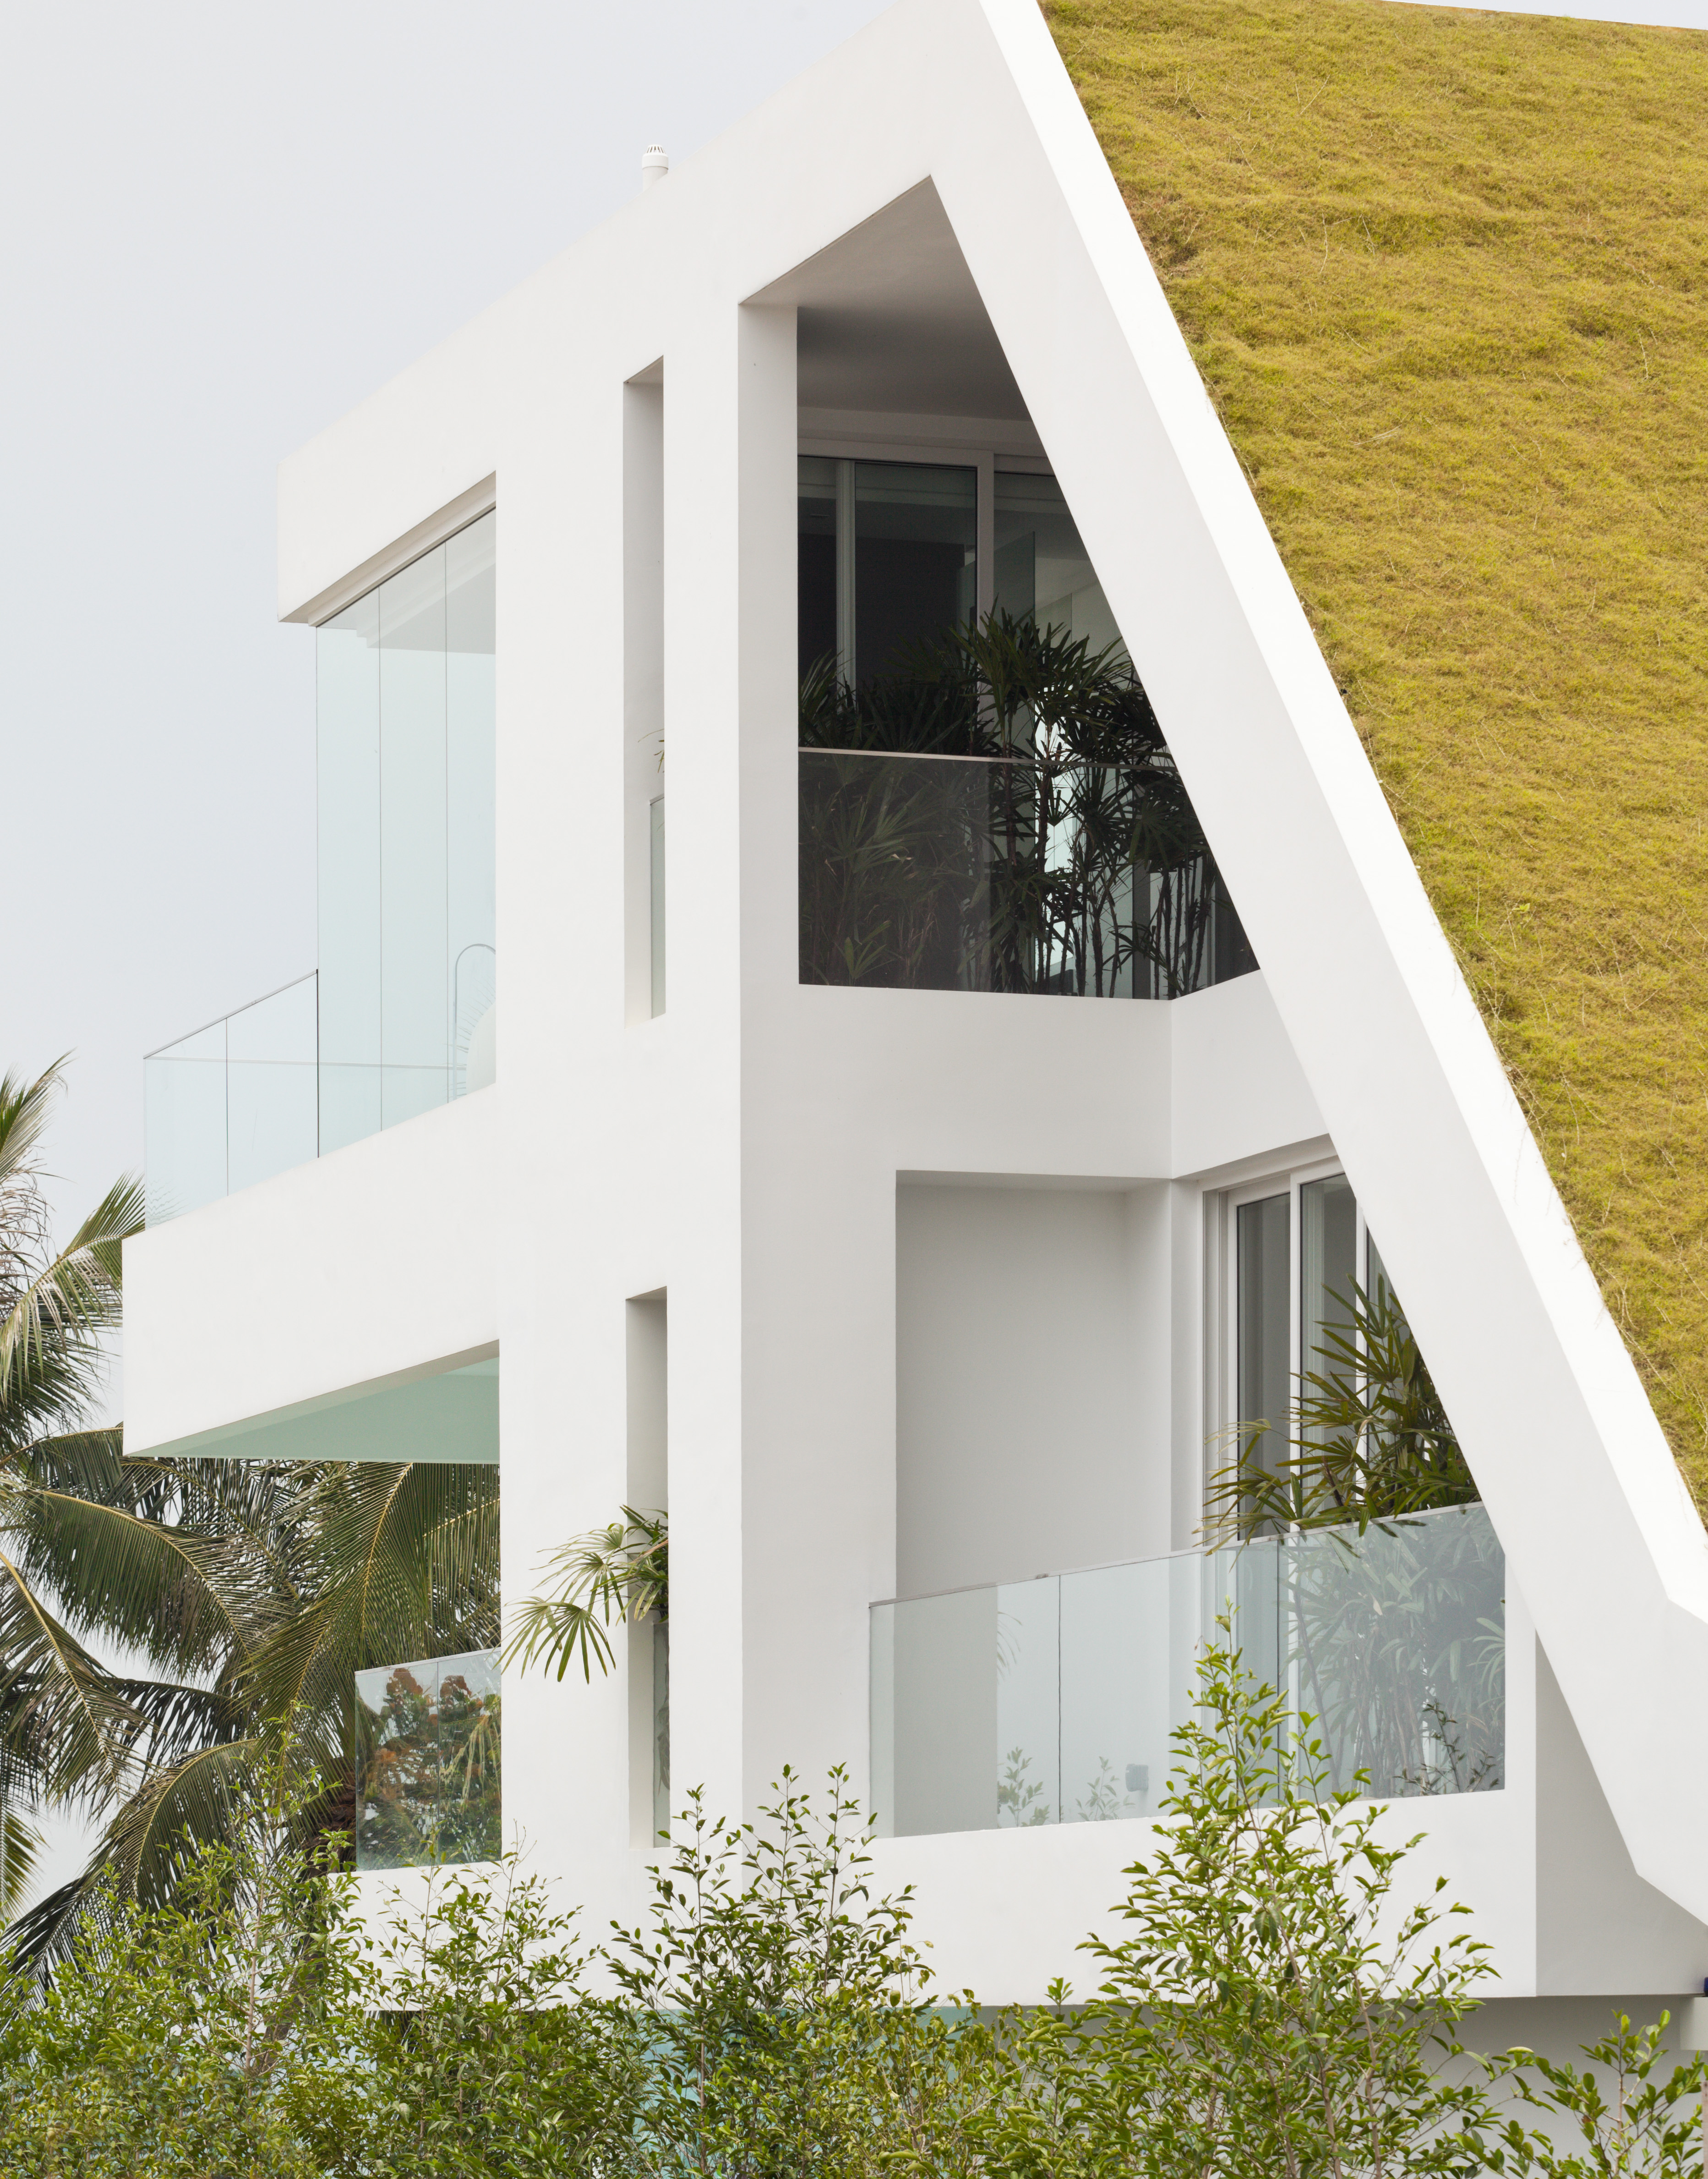 DCA-Sentosa_residence-Robert_Such-2011-003